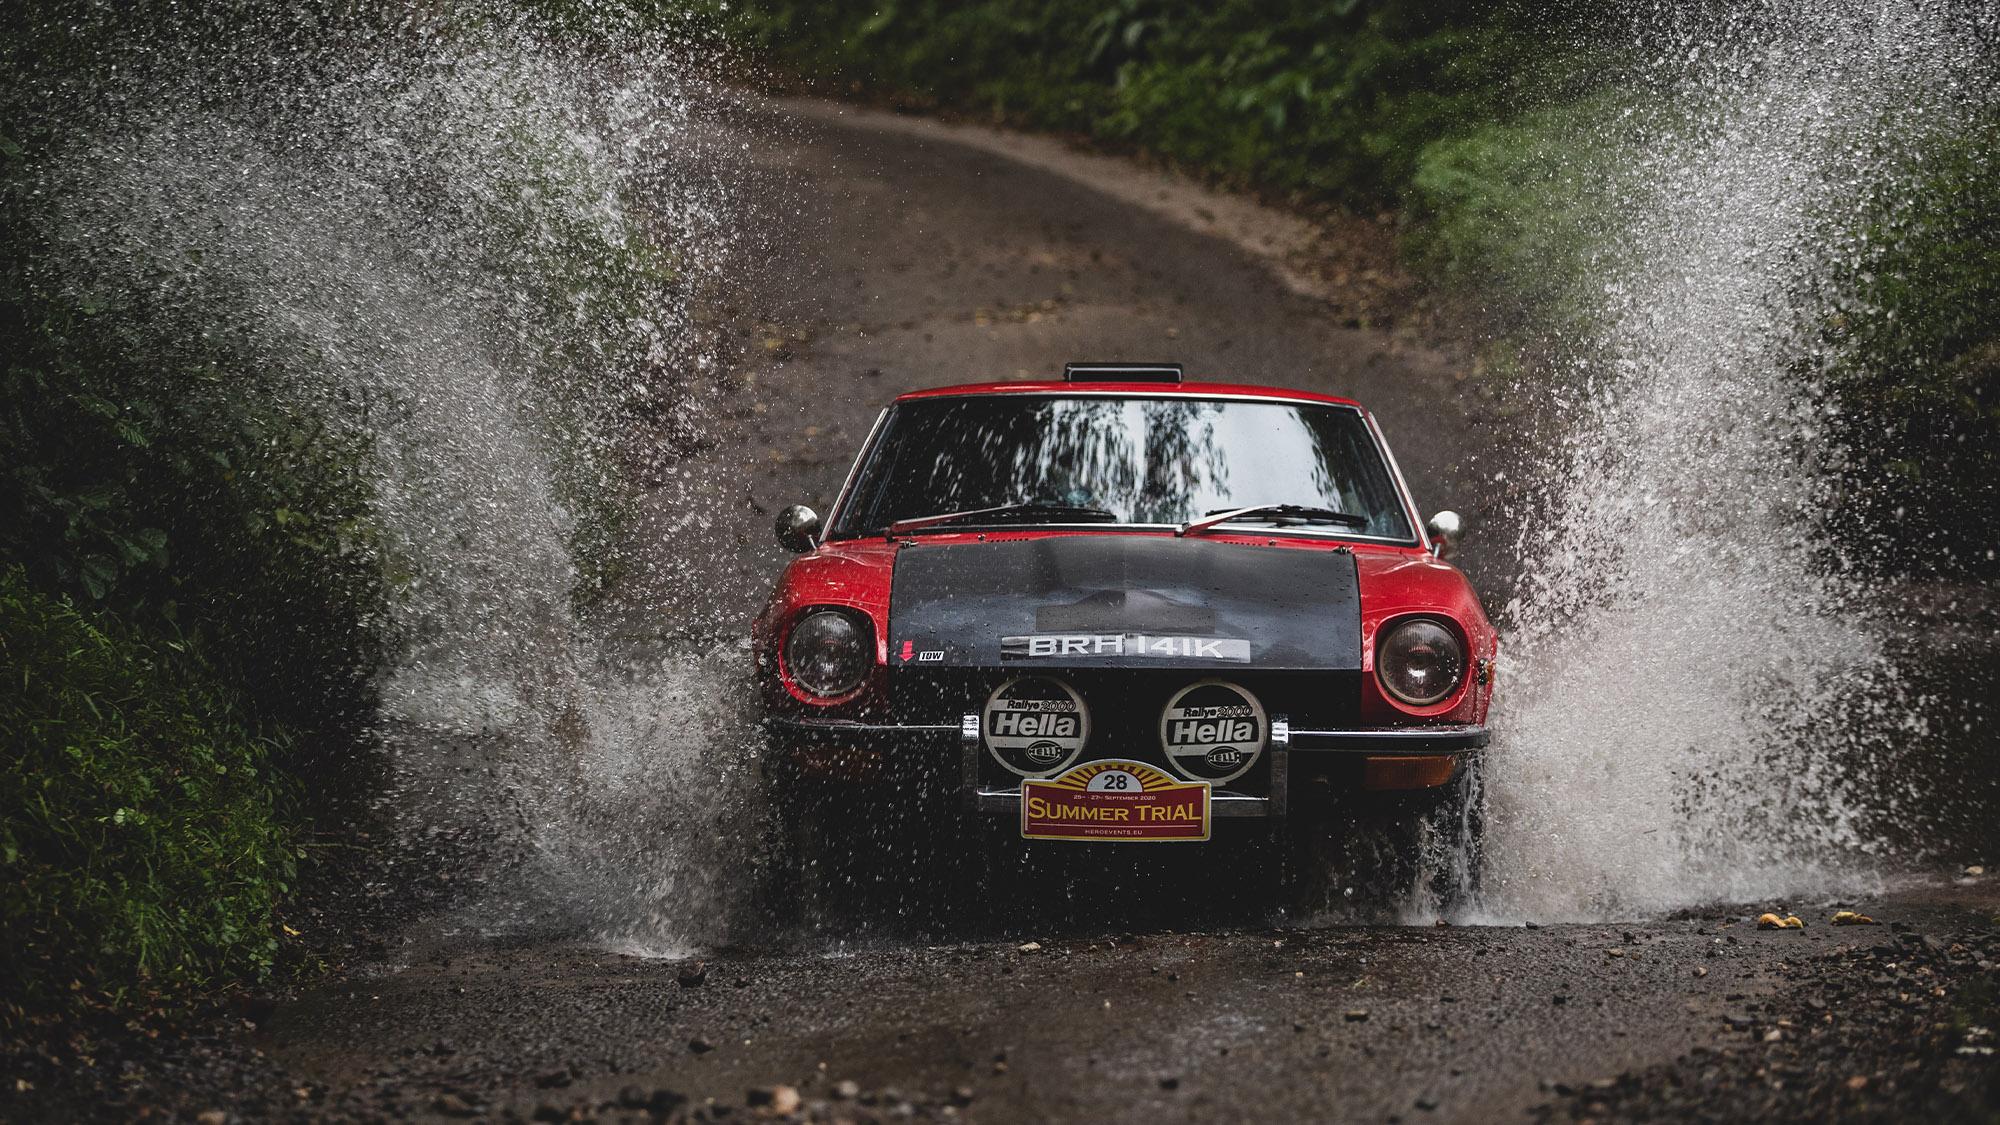 2020 HERO summer trial Datsun